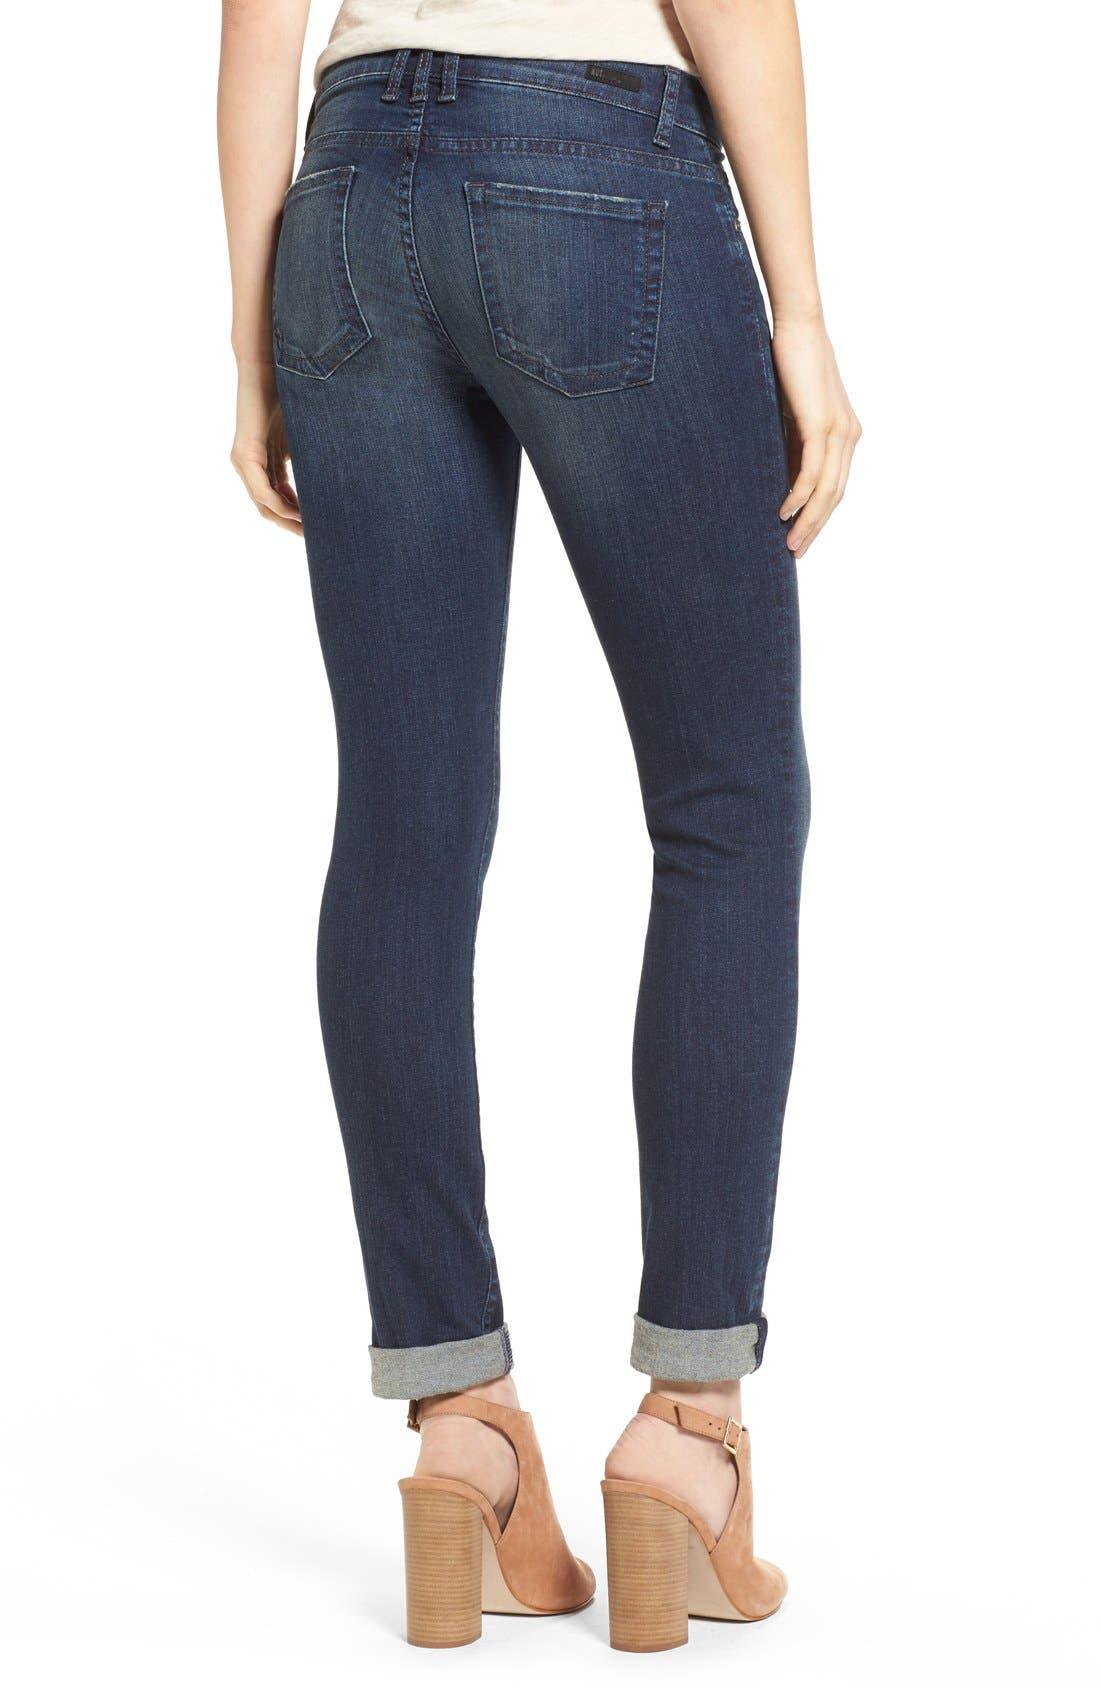 Alternate Image 2  - Kut from the Kloth 'Catherine' Slim Boyfriend Jeans (Carefulness) (Regular & Petite)